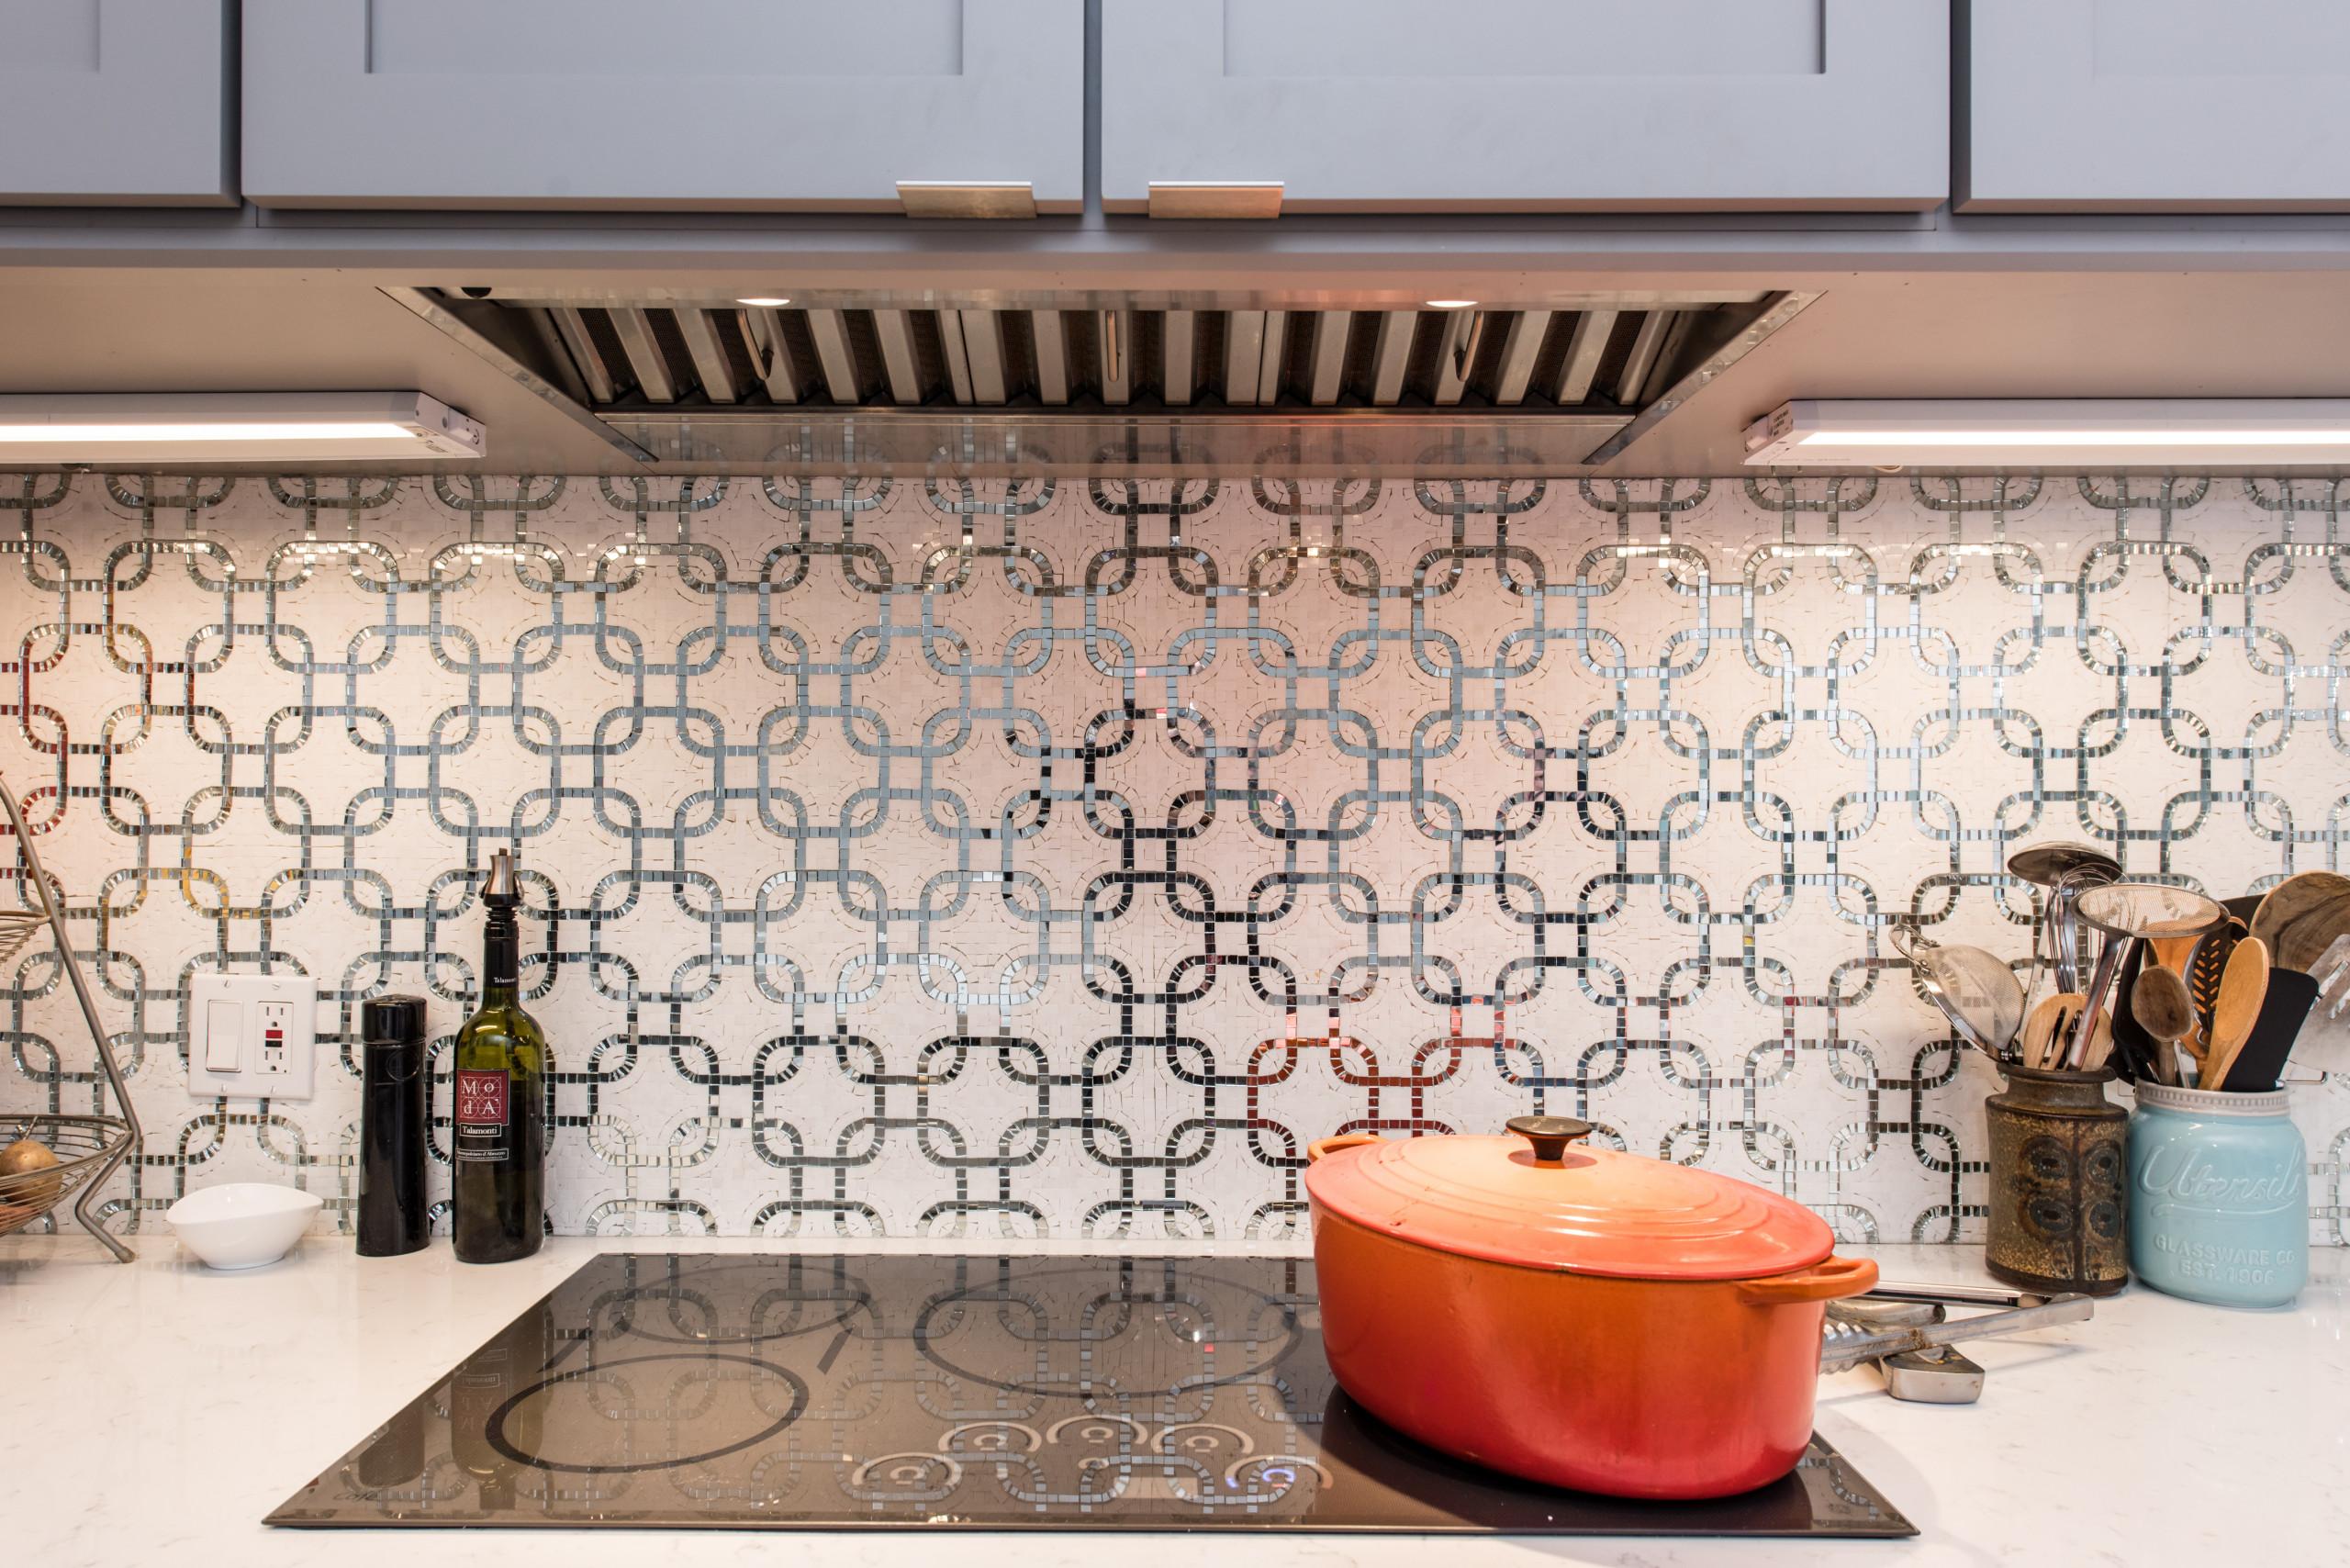 Beautiful mosaic marble and metal patterned backsplash